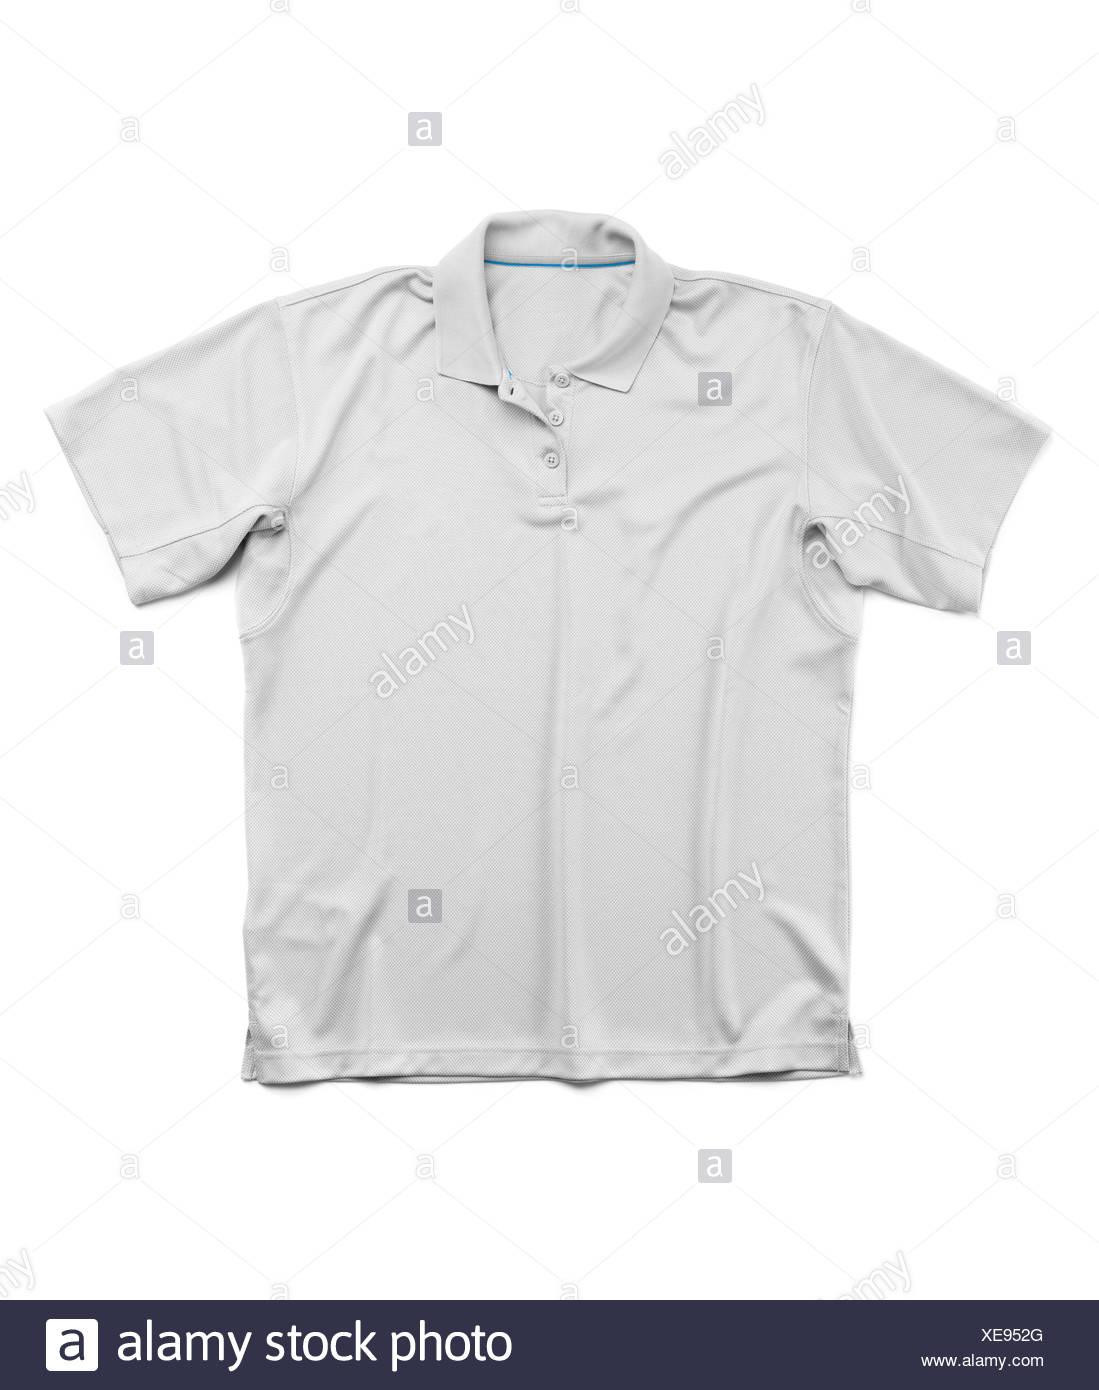 Los hombres verano gris de manga corta polo shirt Imagen De Stock